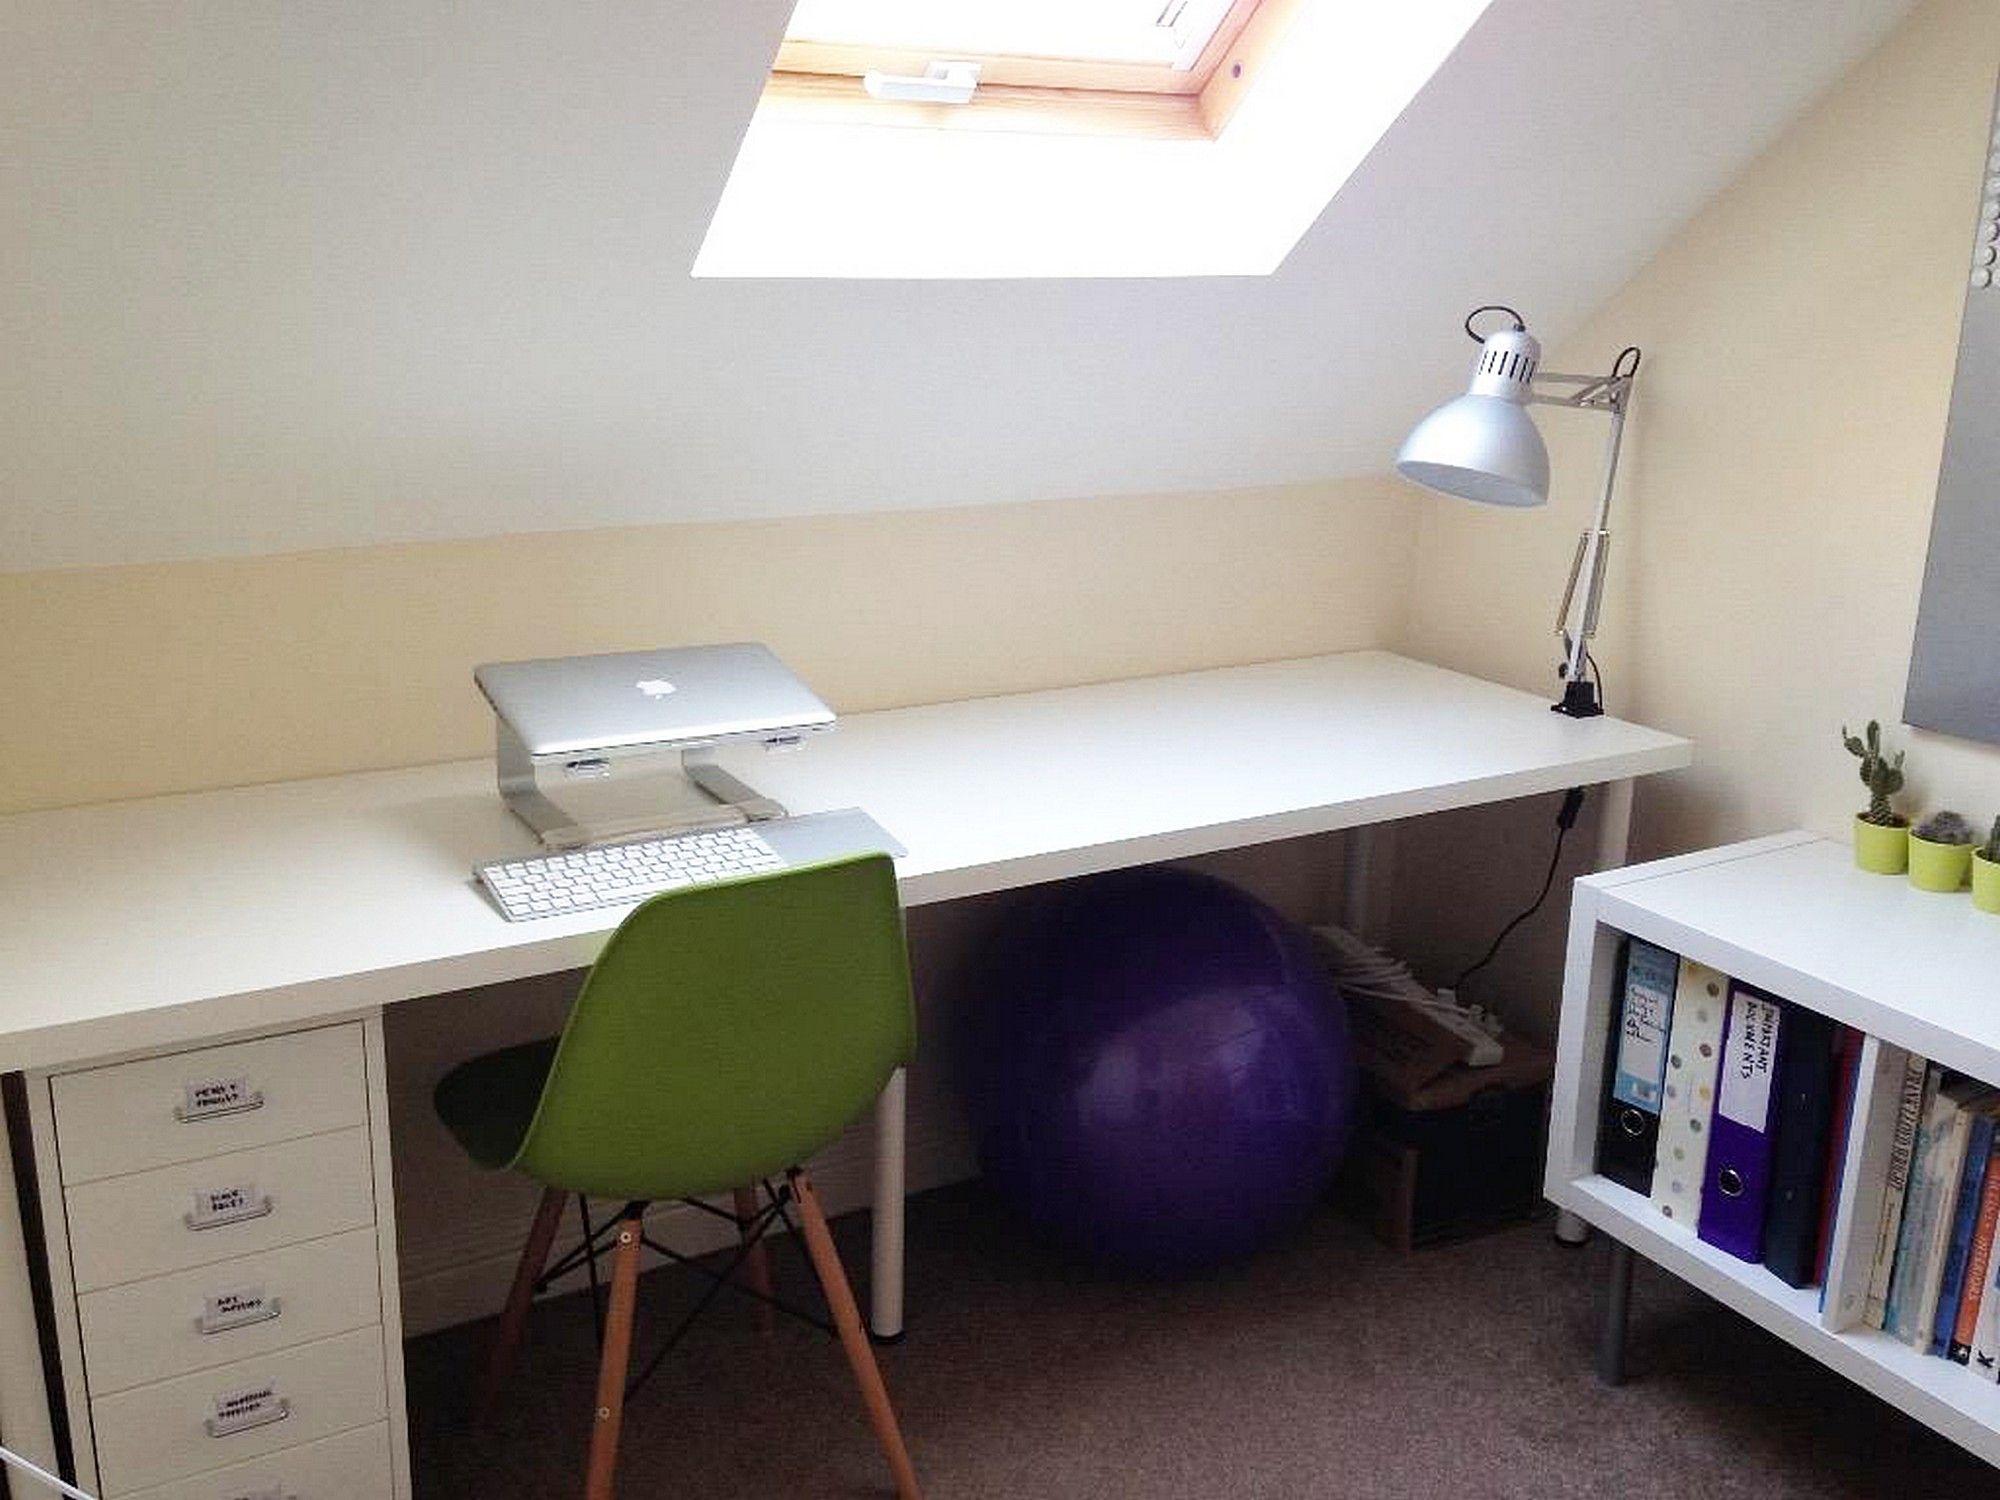 Ikea desk top linnmon with adils legs combinaton office ideas